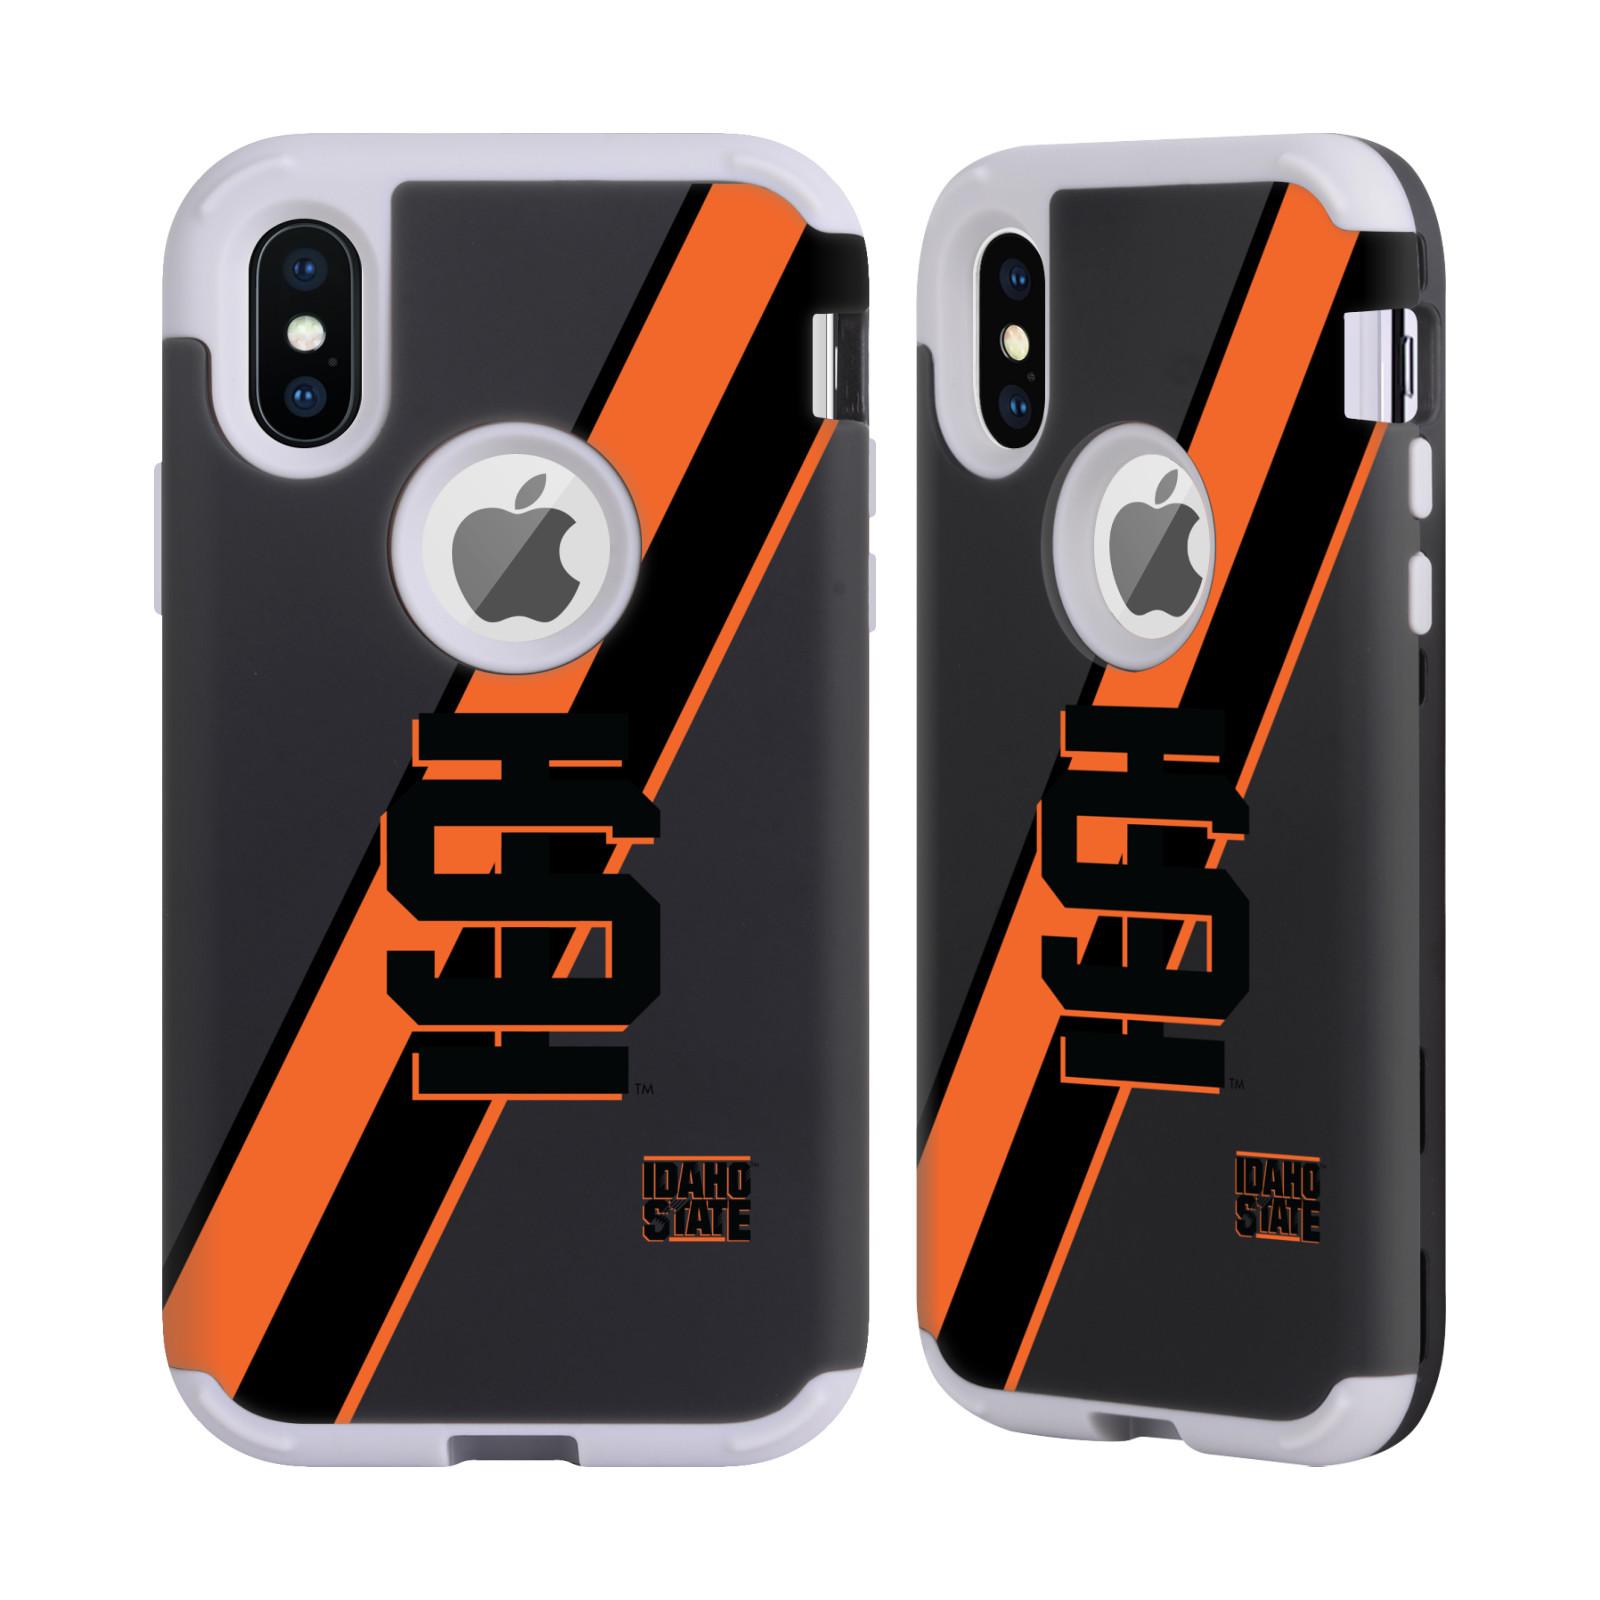 IDAHO-STATE-UNIVERSITY-ISU-2-GREY-SENTRY-CASE-FOR-APPLE-iPHONE-SAMSUNG-PHONES